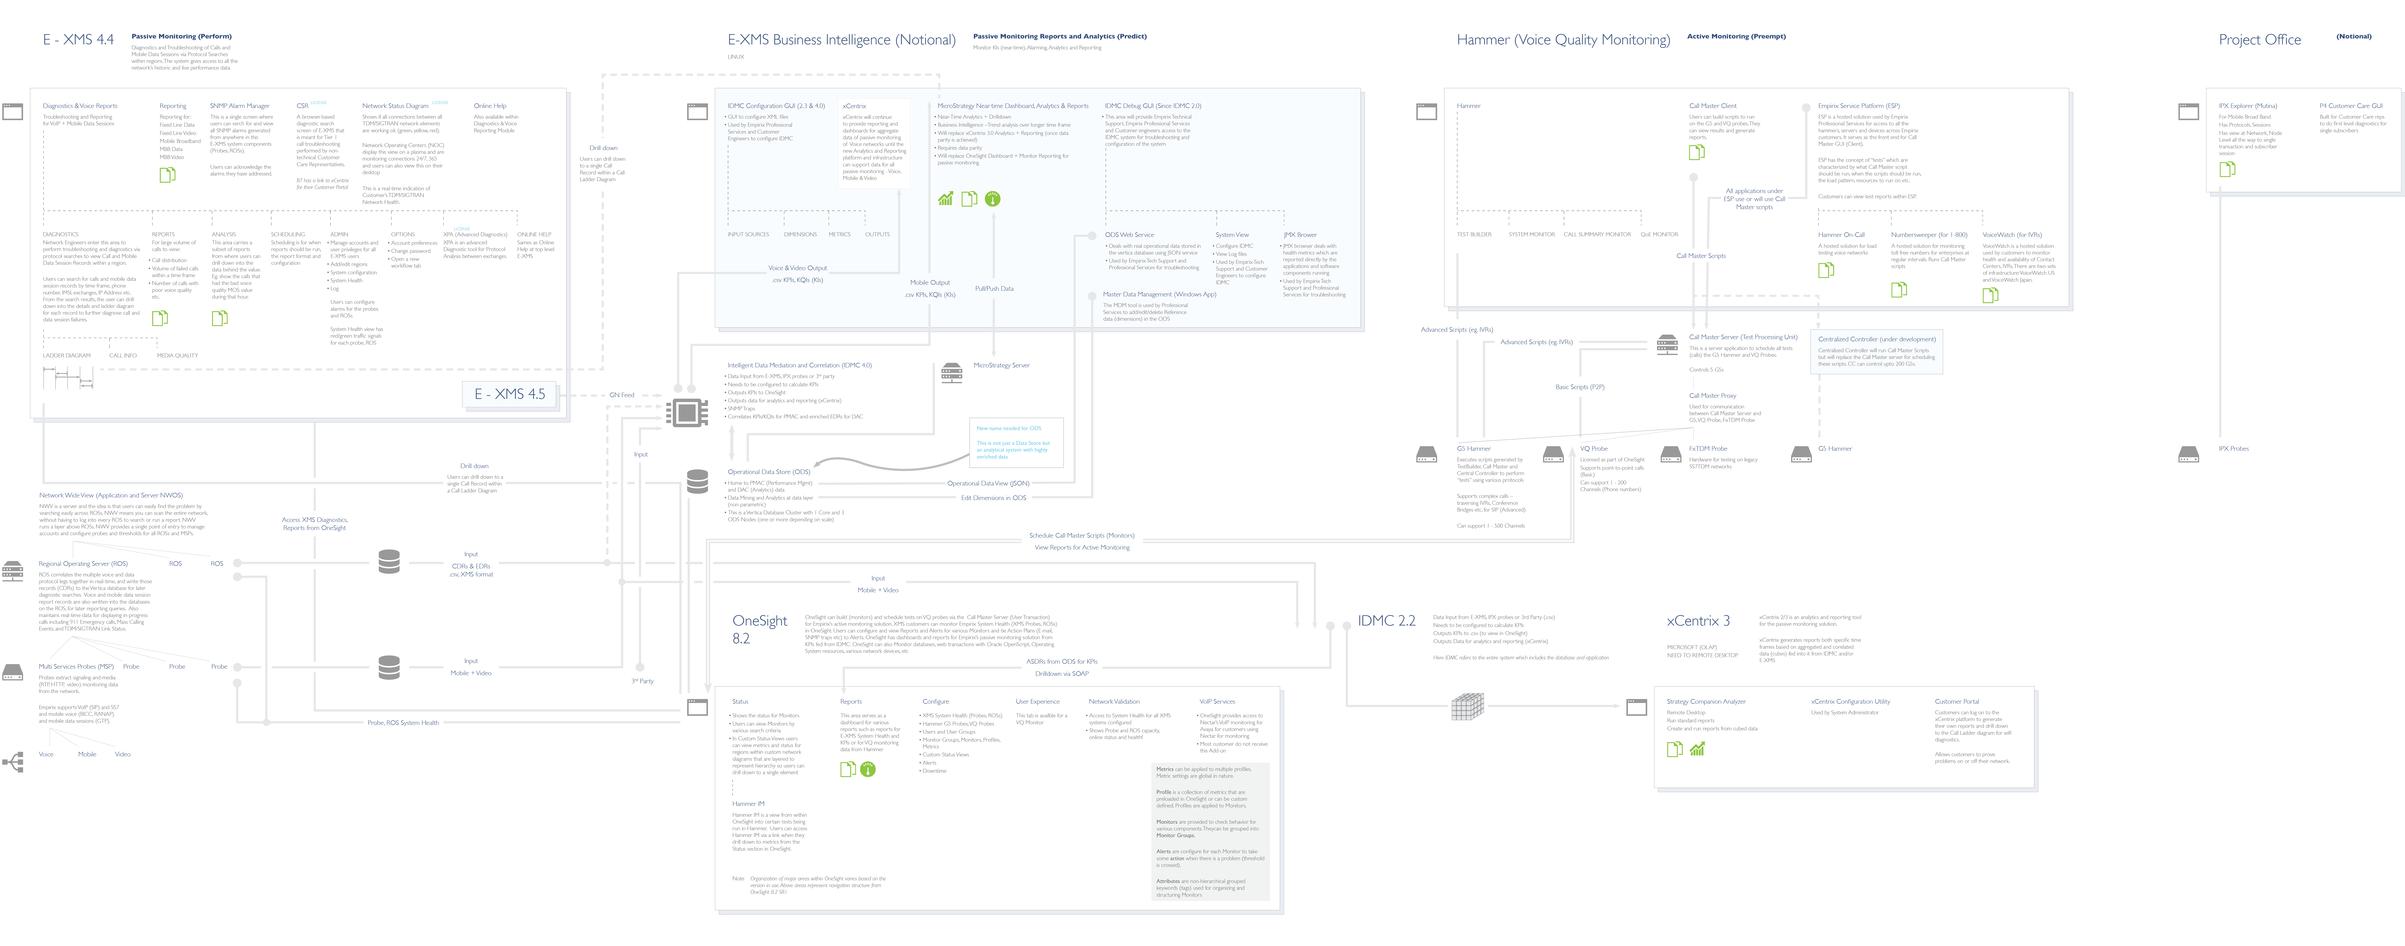 Empirix_product_ecosystem_v2.png